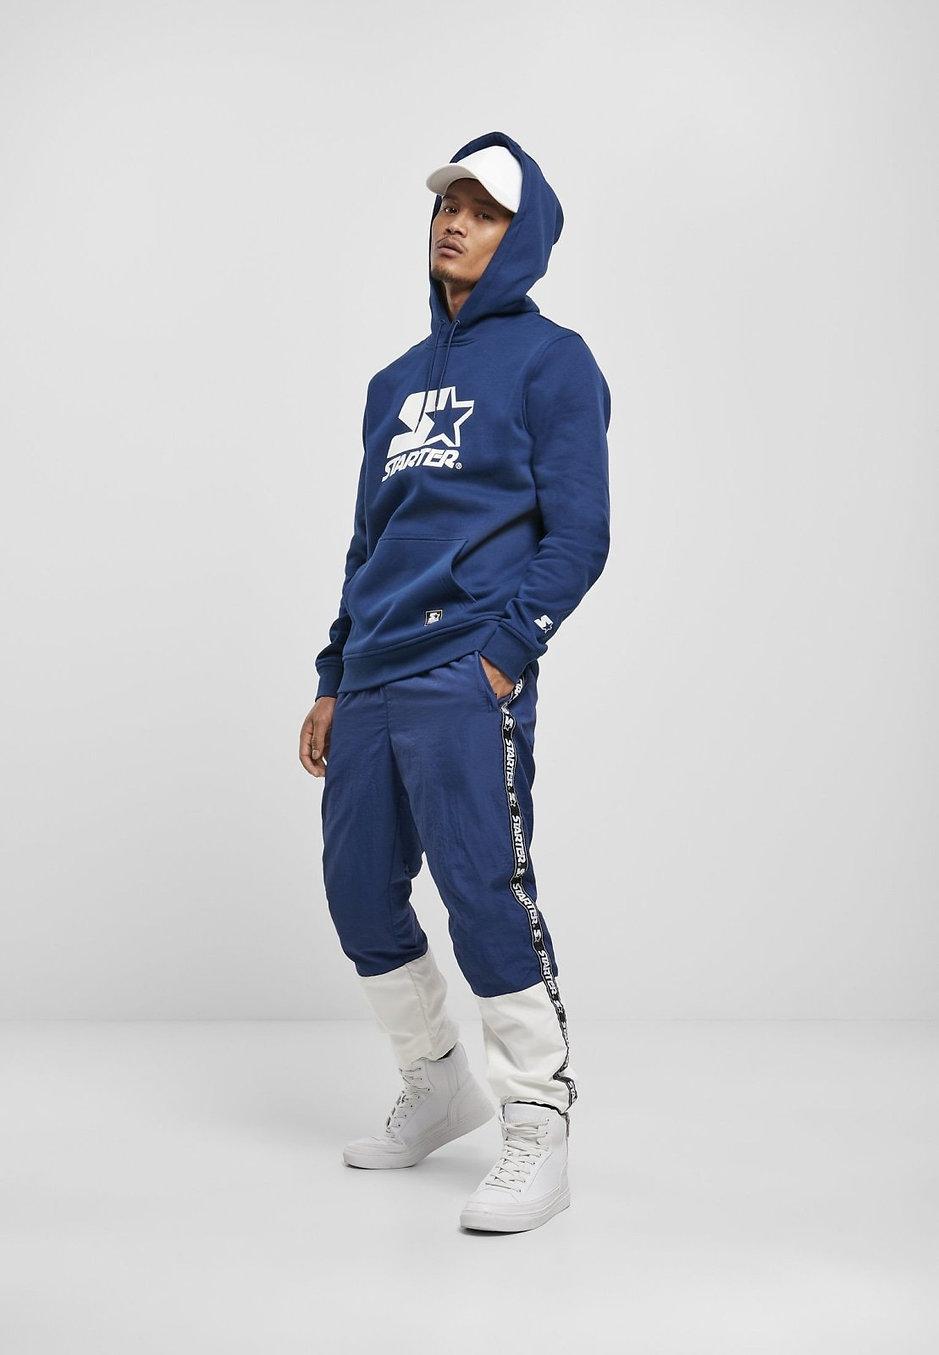 starter-two-toned-jogging-pants-norvine-217.jpg